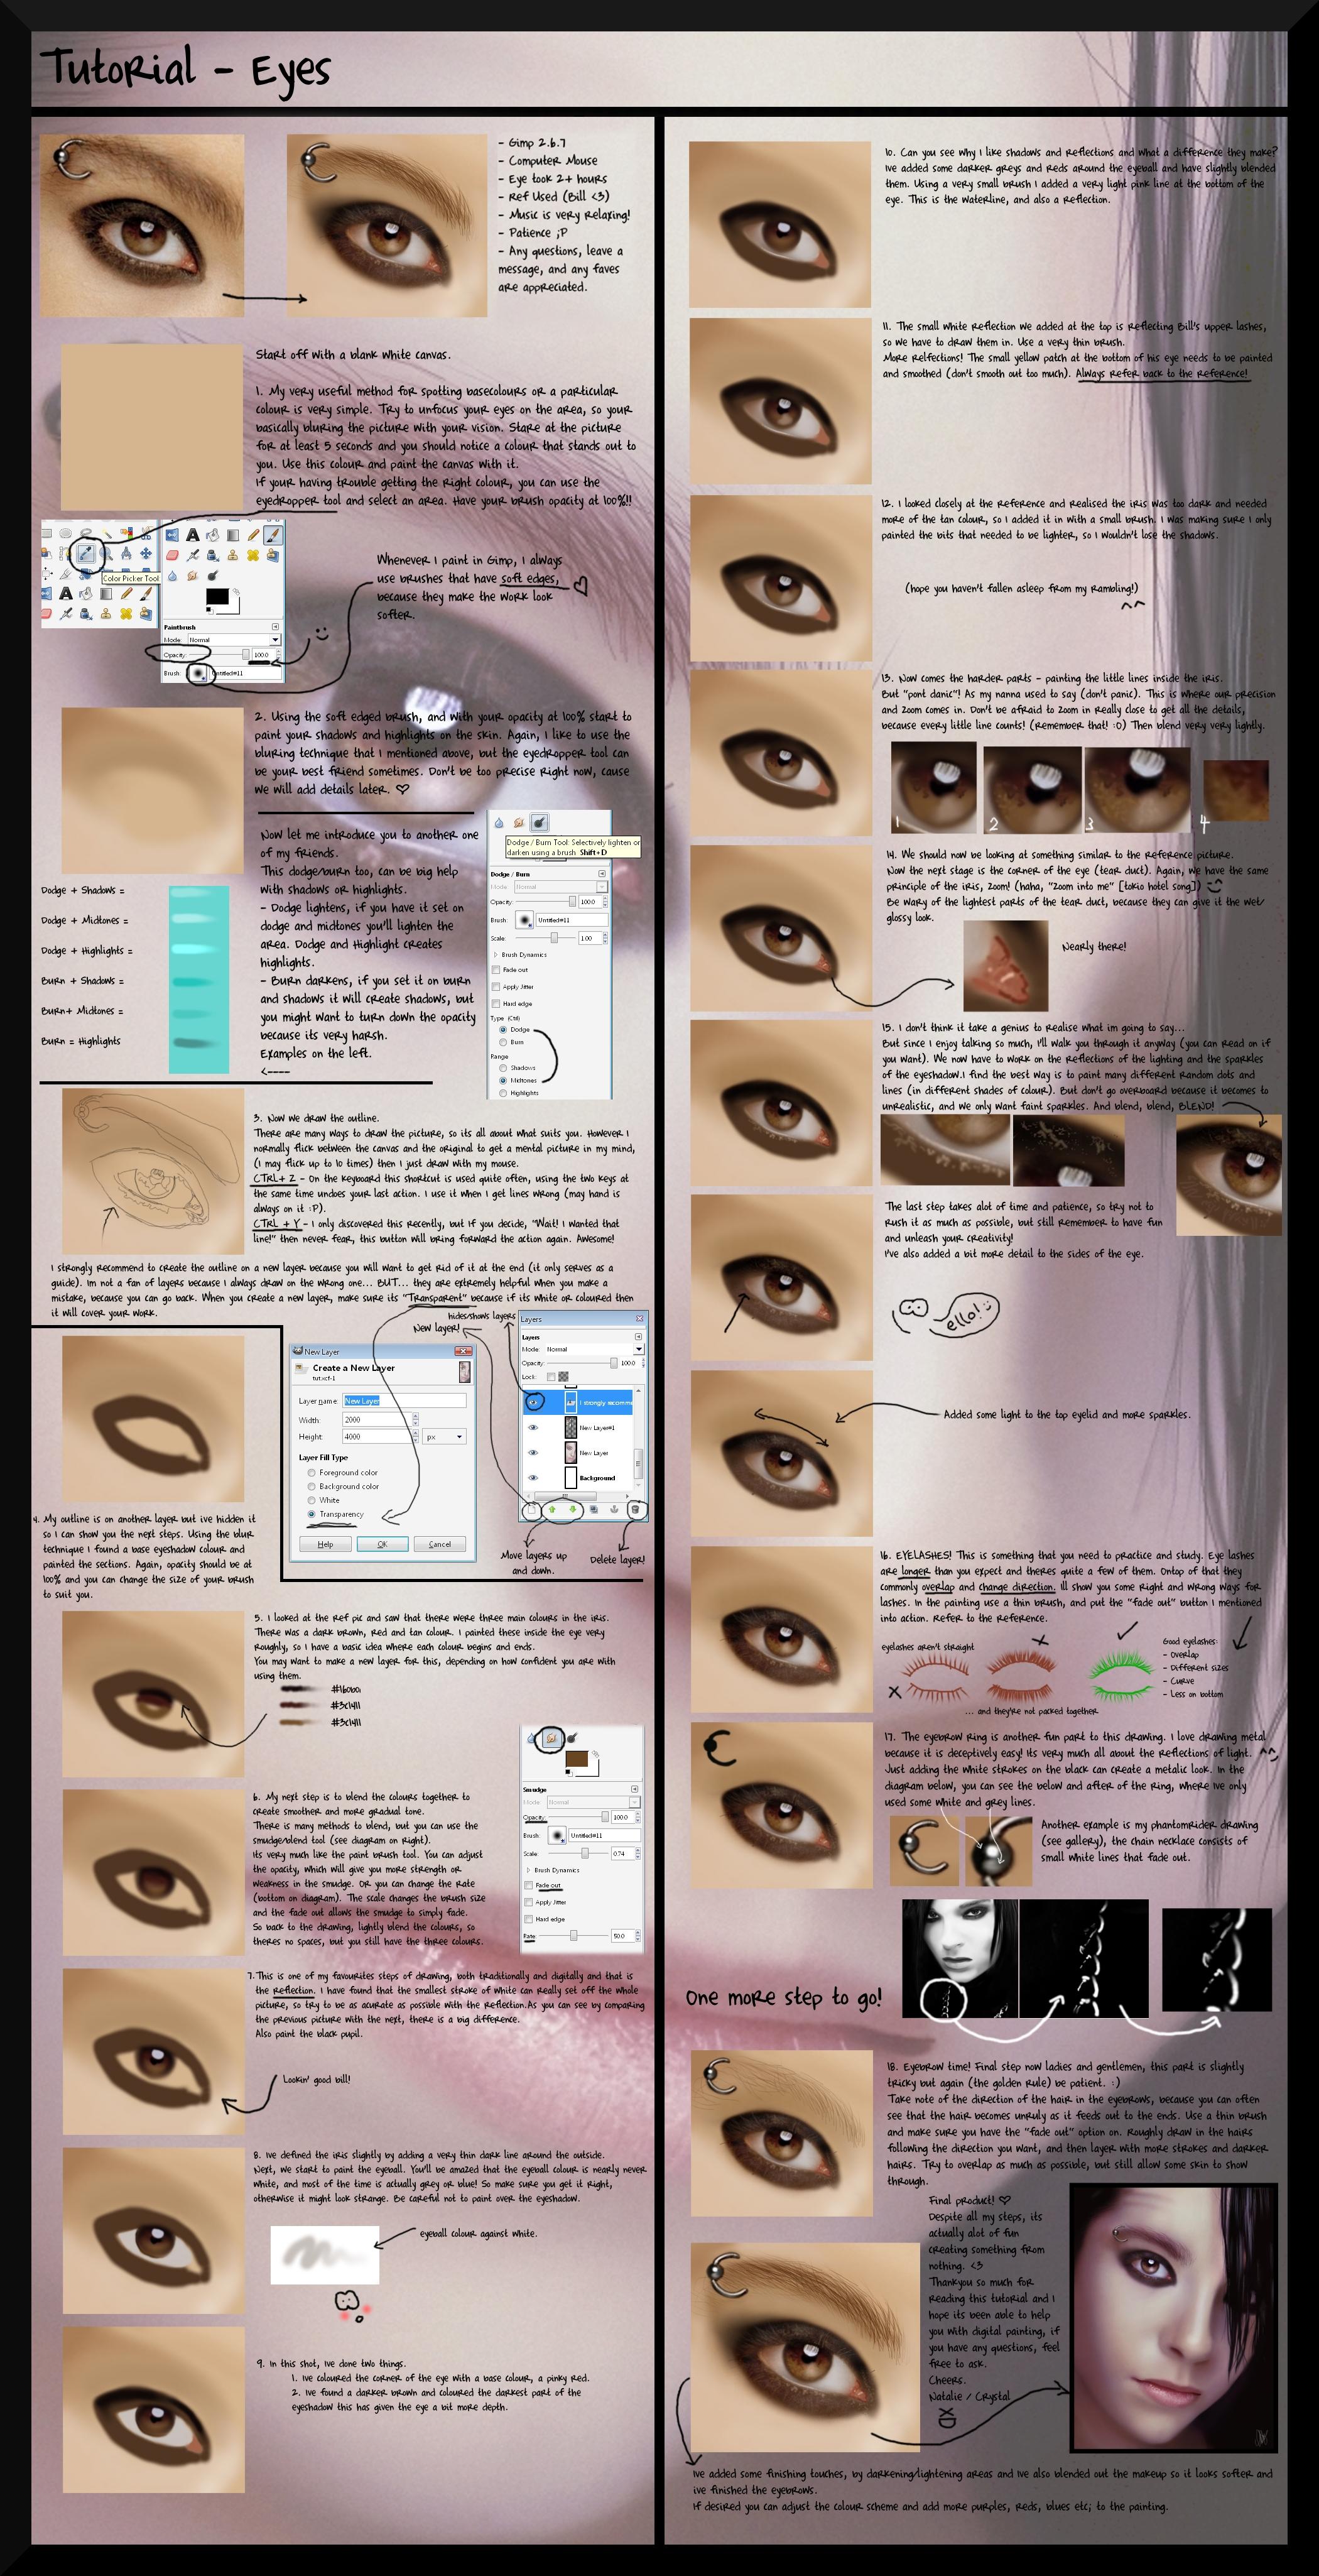 How I Draw Eyes - Tutorial by nataliebeth